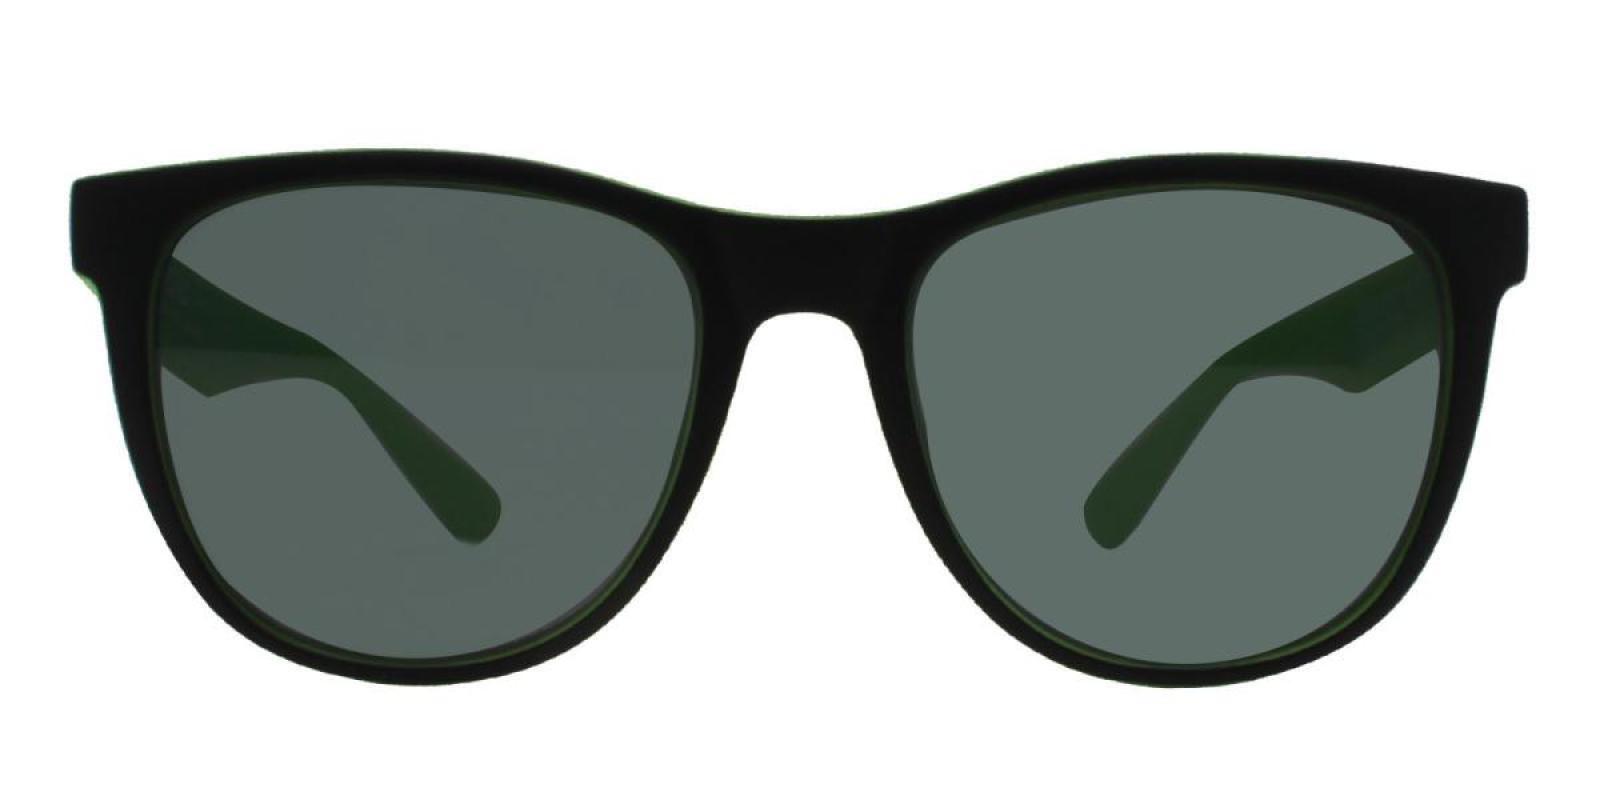 Malibu-Green-Cat-TR-Sunglasses-additional2